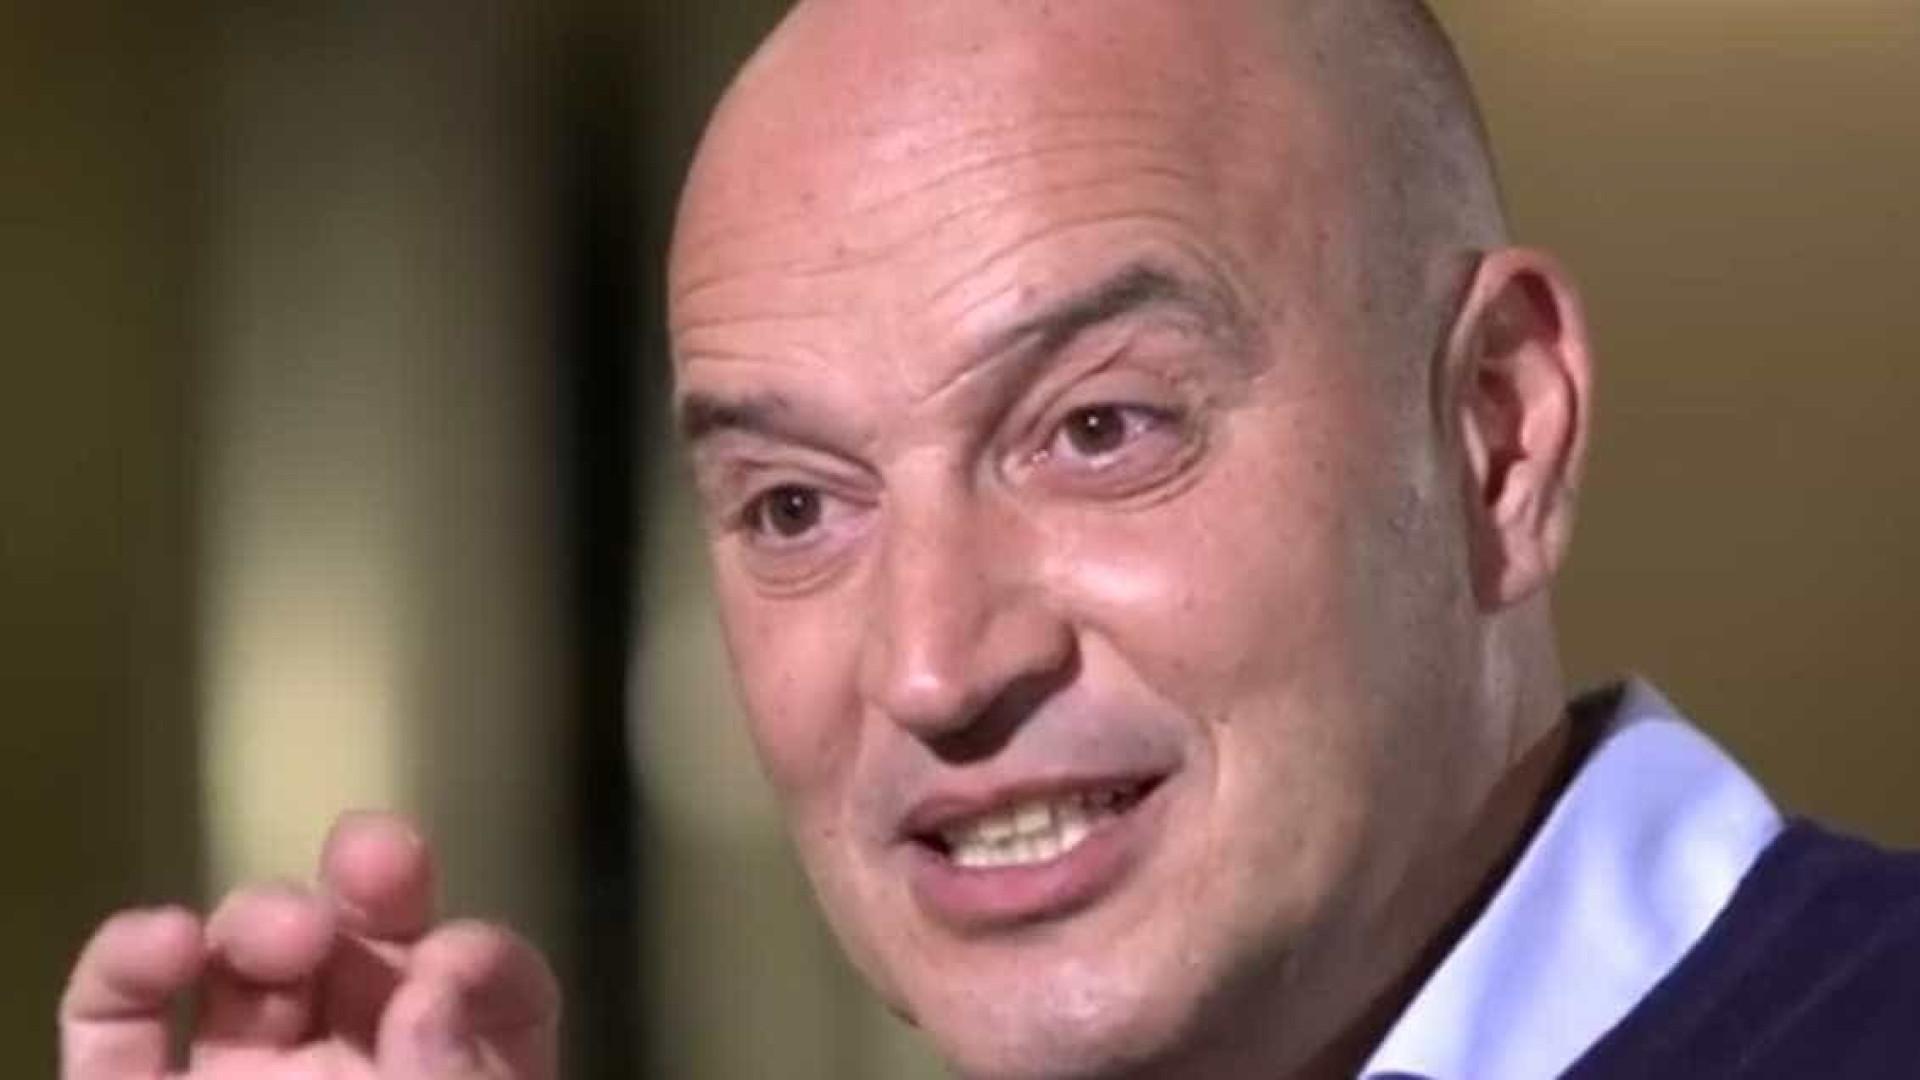 Nuno Graciano admite que recebeu ajuda financeira dos amigos